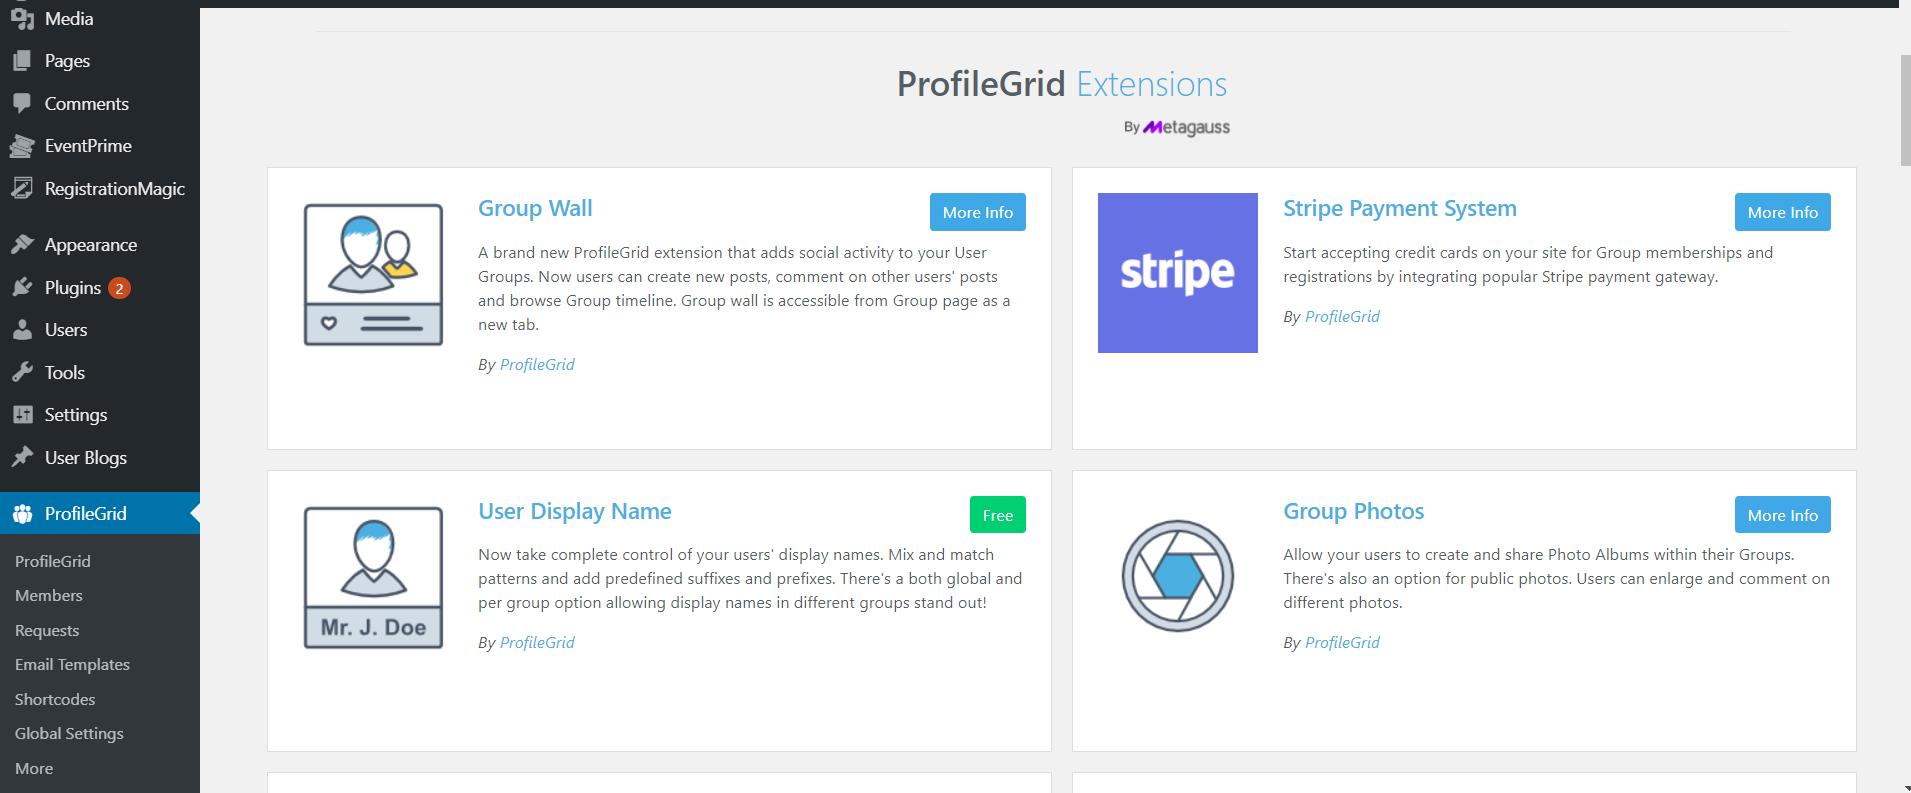 ProfileGrid Extensions